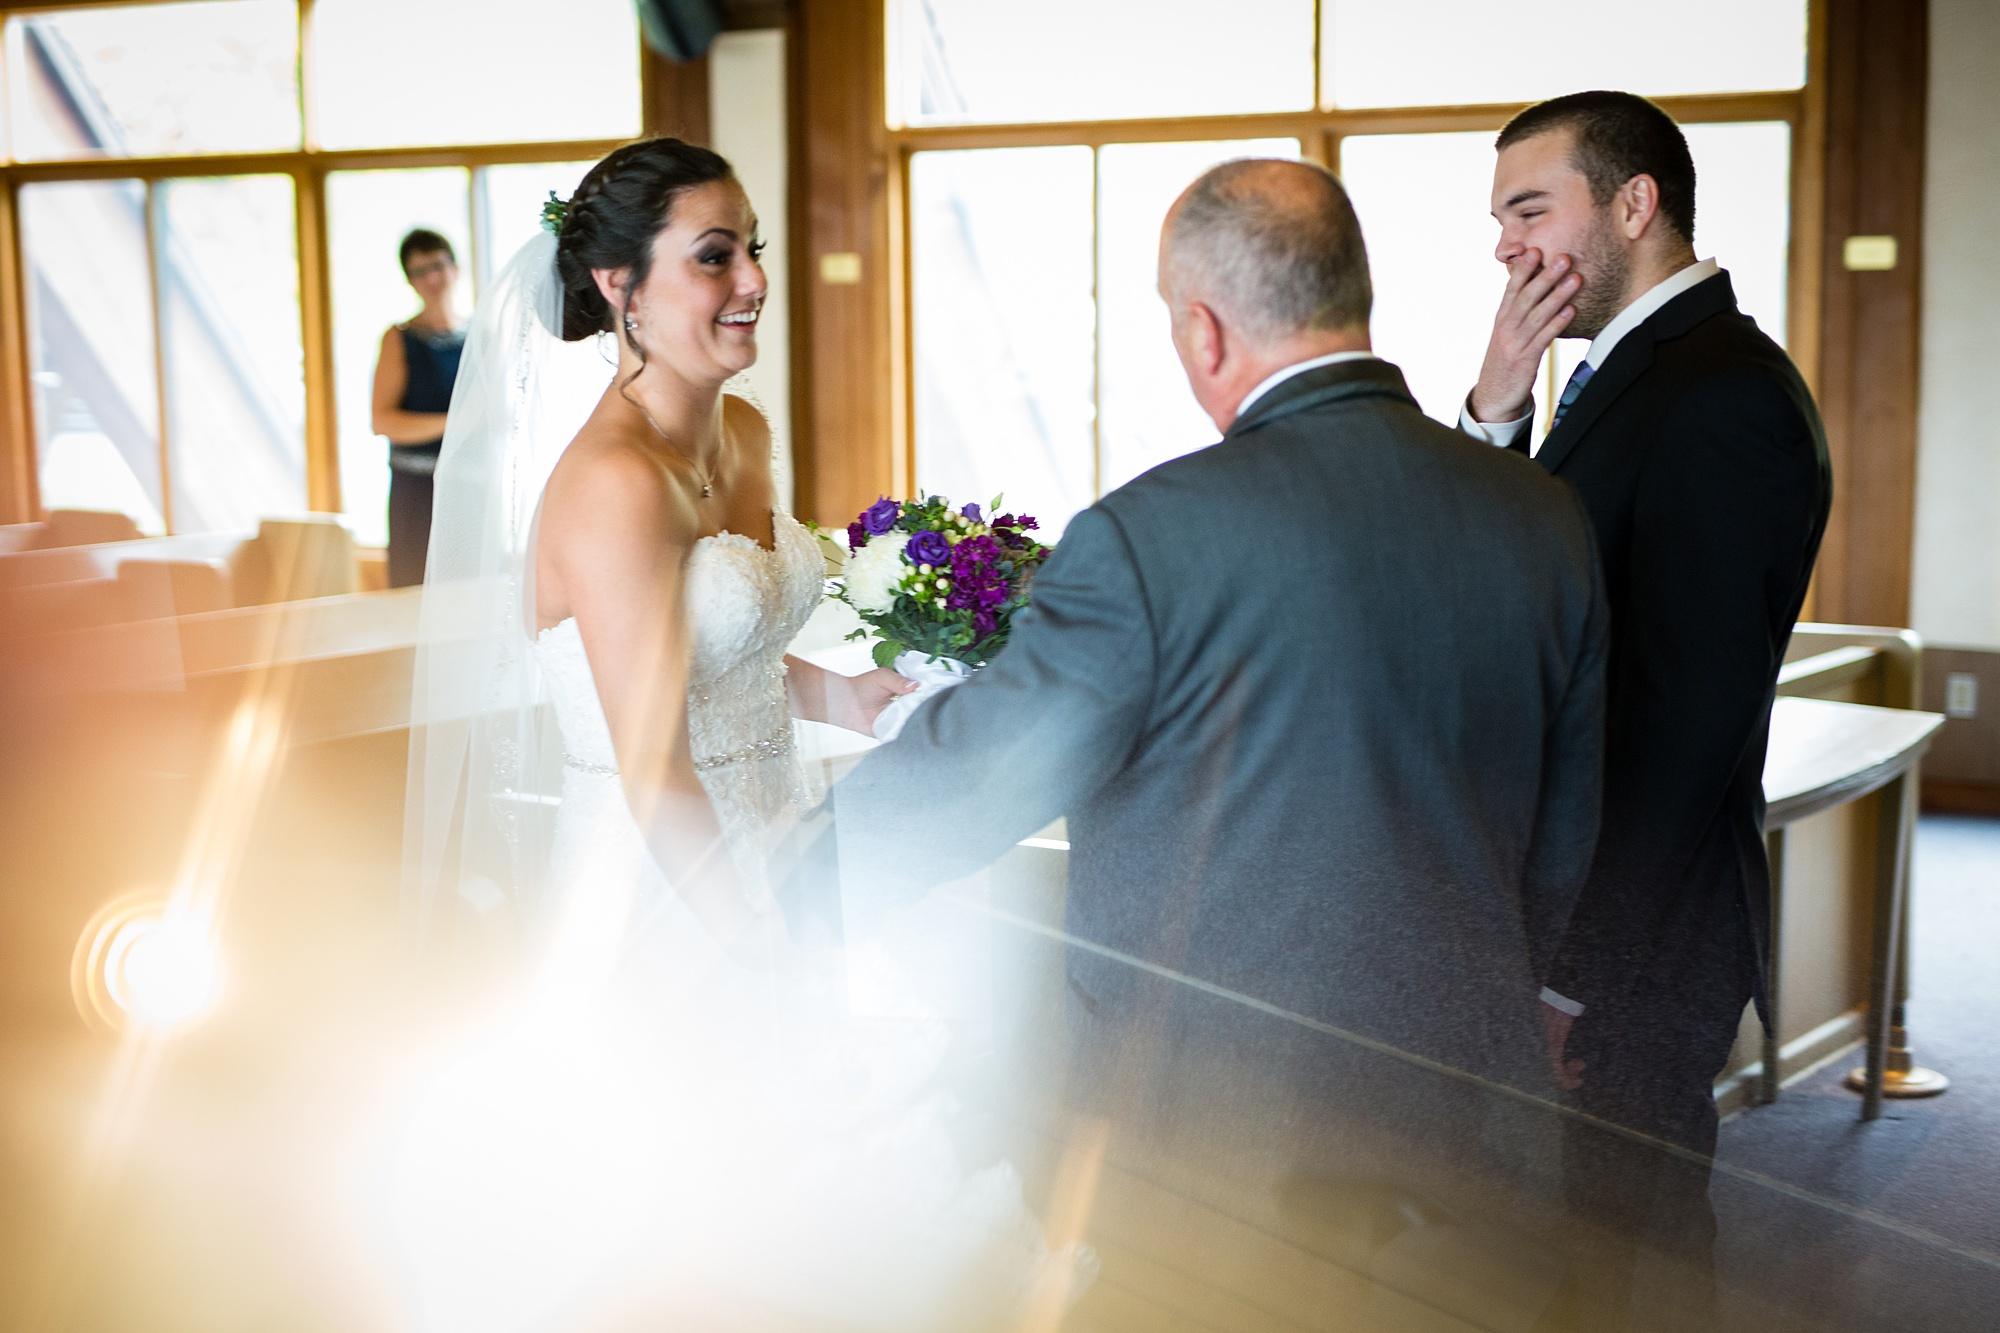 Brandon_Shafer_Photography_Emily_Travis_Kalamazoo_Wedding_Photography_0017.jpg